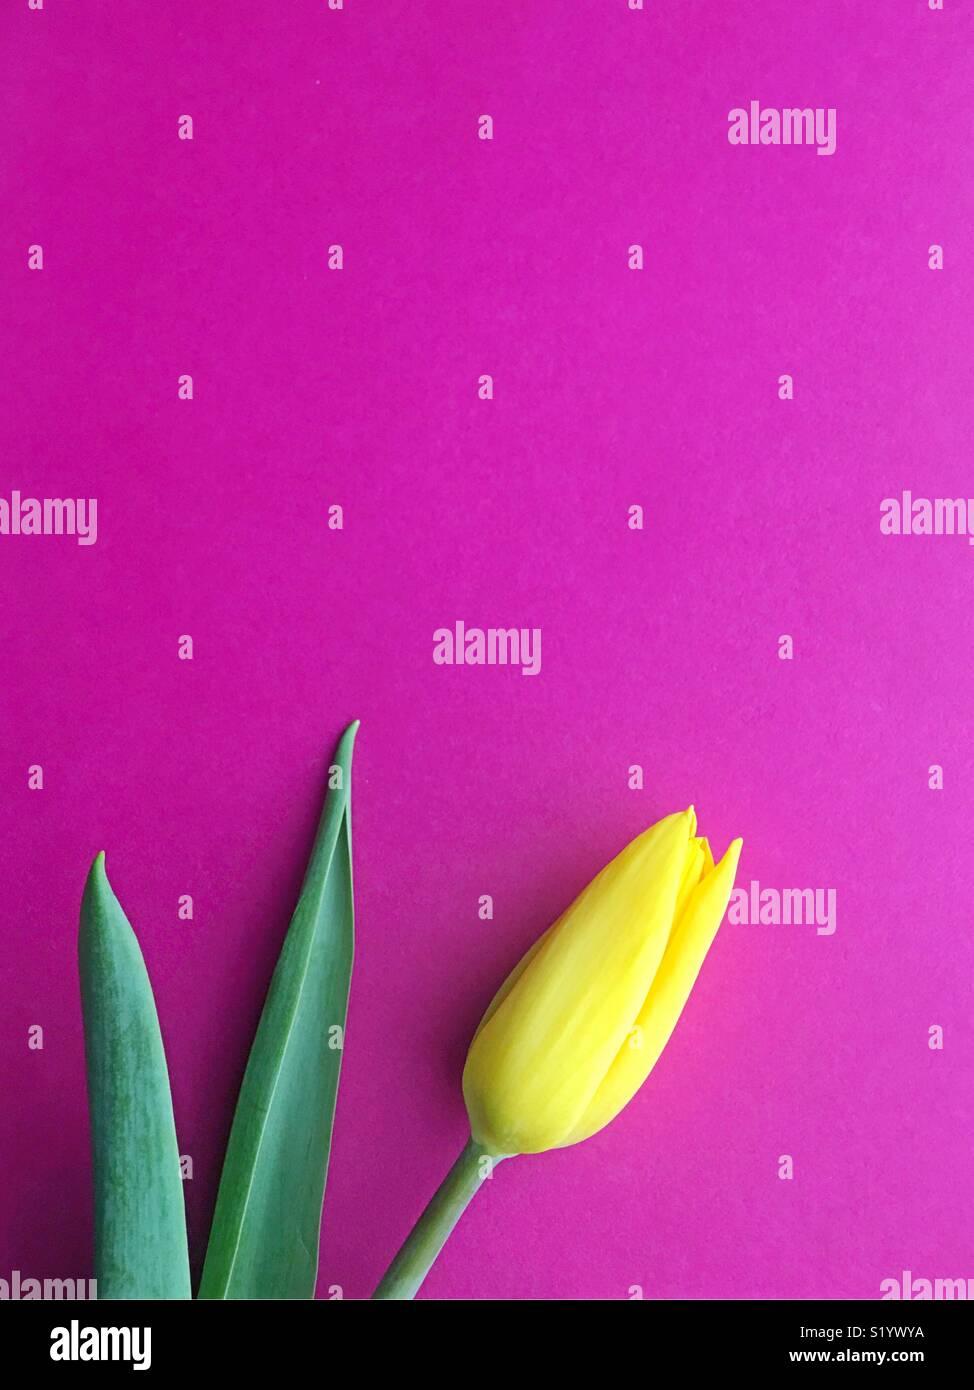 A single yellow tulip. - Stock Image